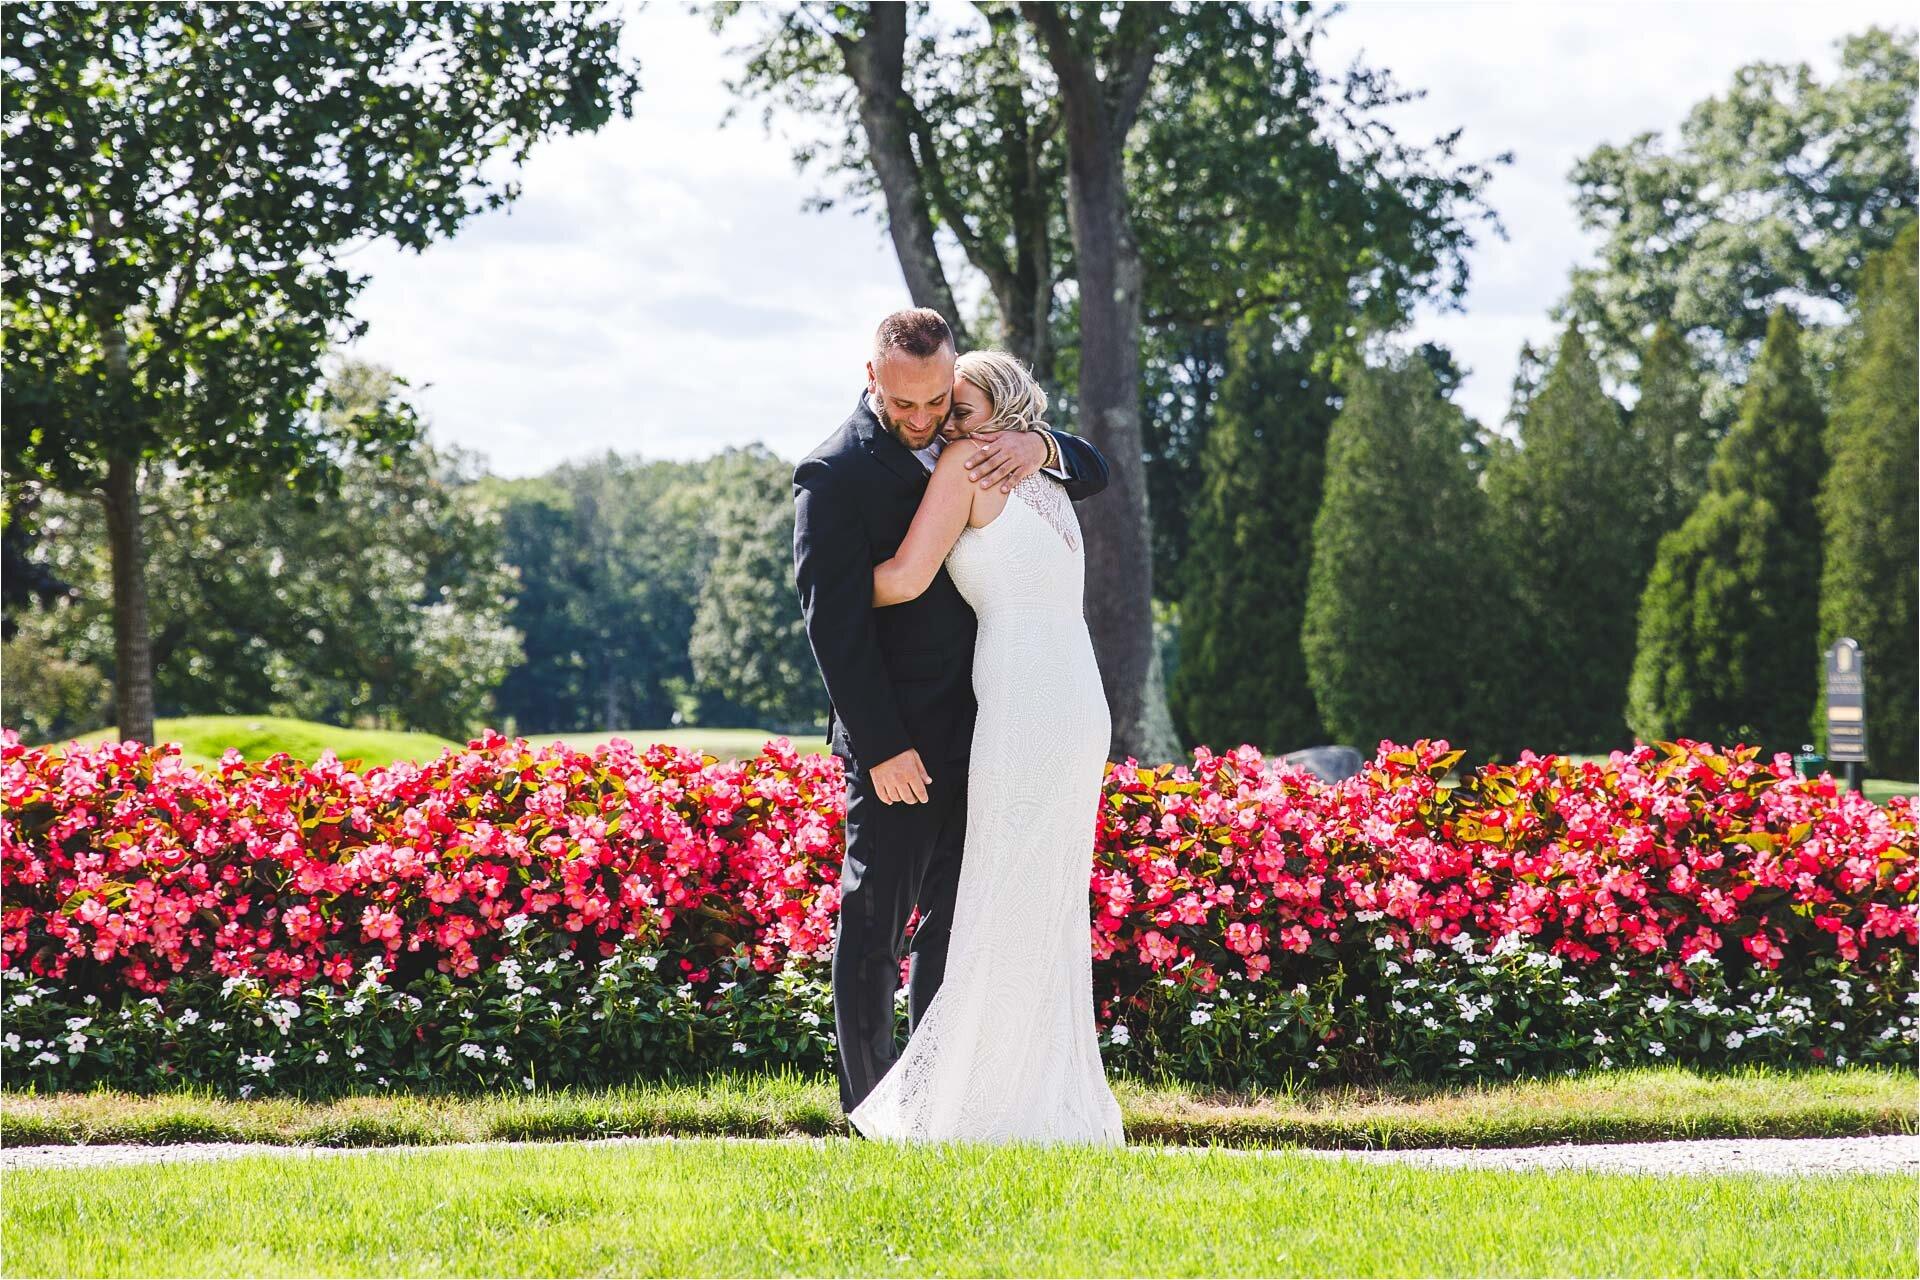 racebrook-countryclub-wedding-photography-12.jpg